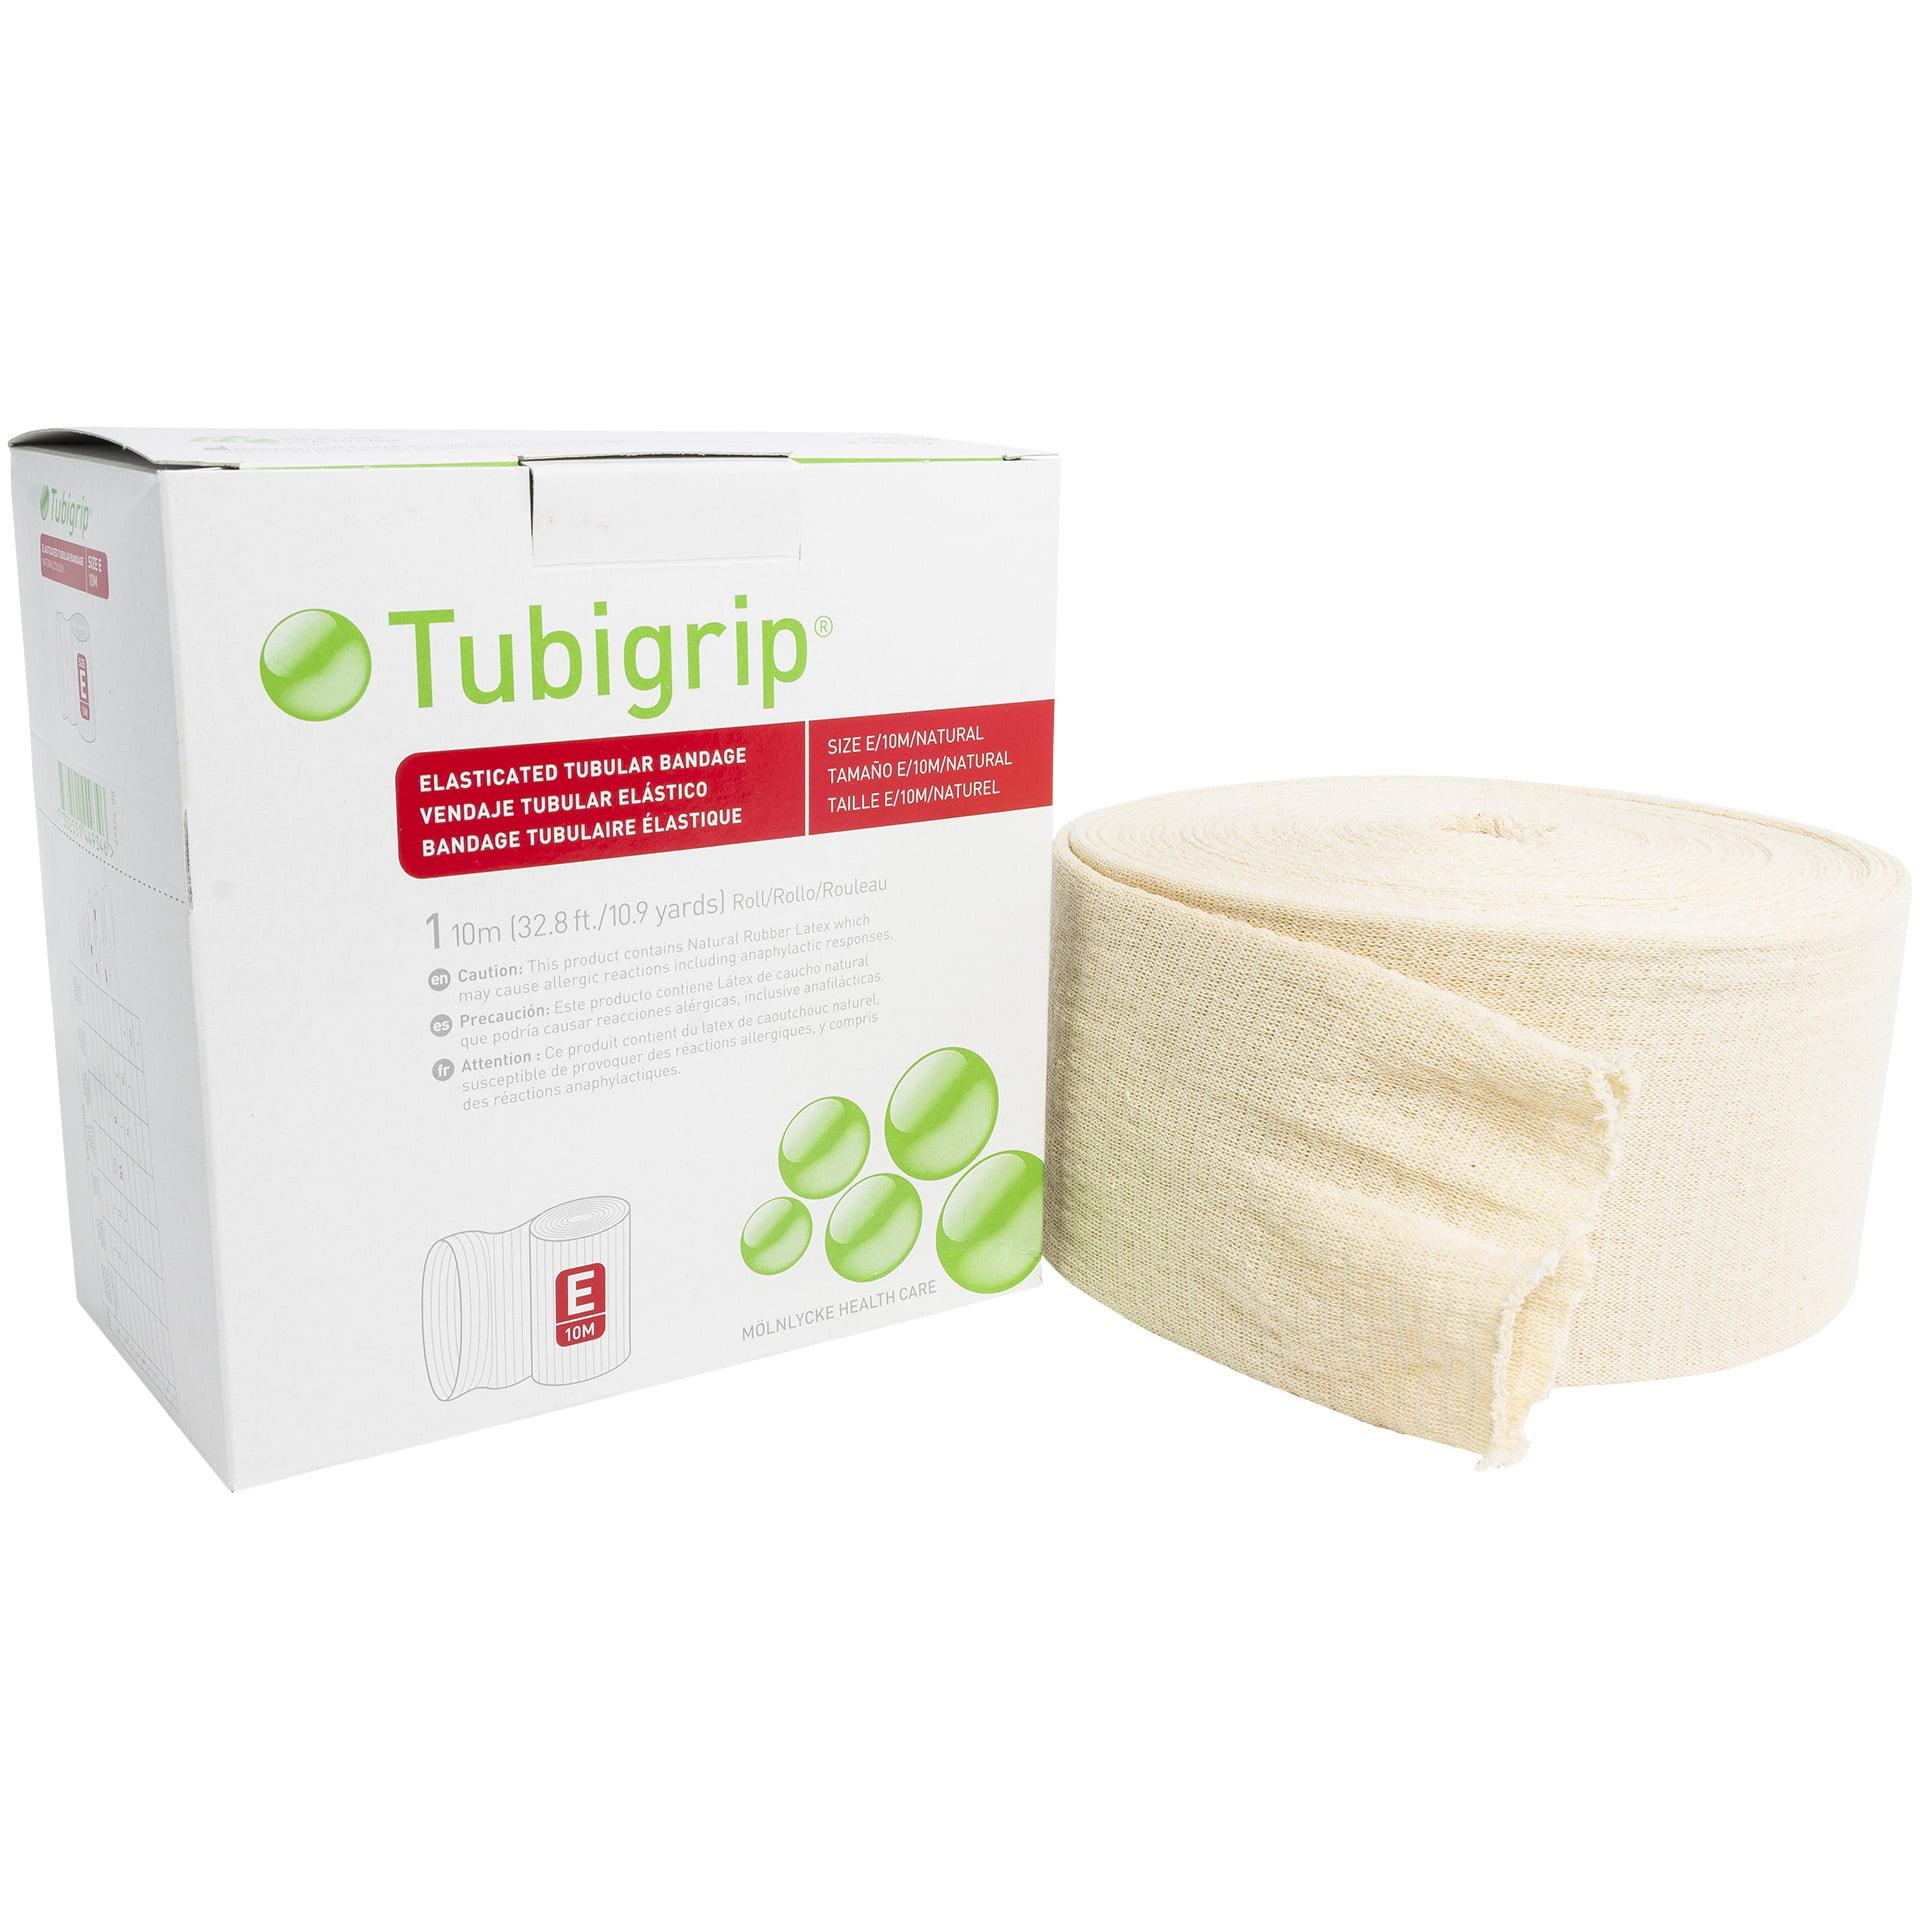 "Tubigrip E - 3.5"" x 10 Meter Elastic Tubular Bandage - Na..."